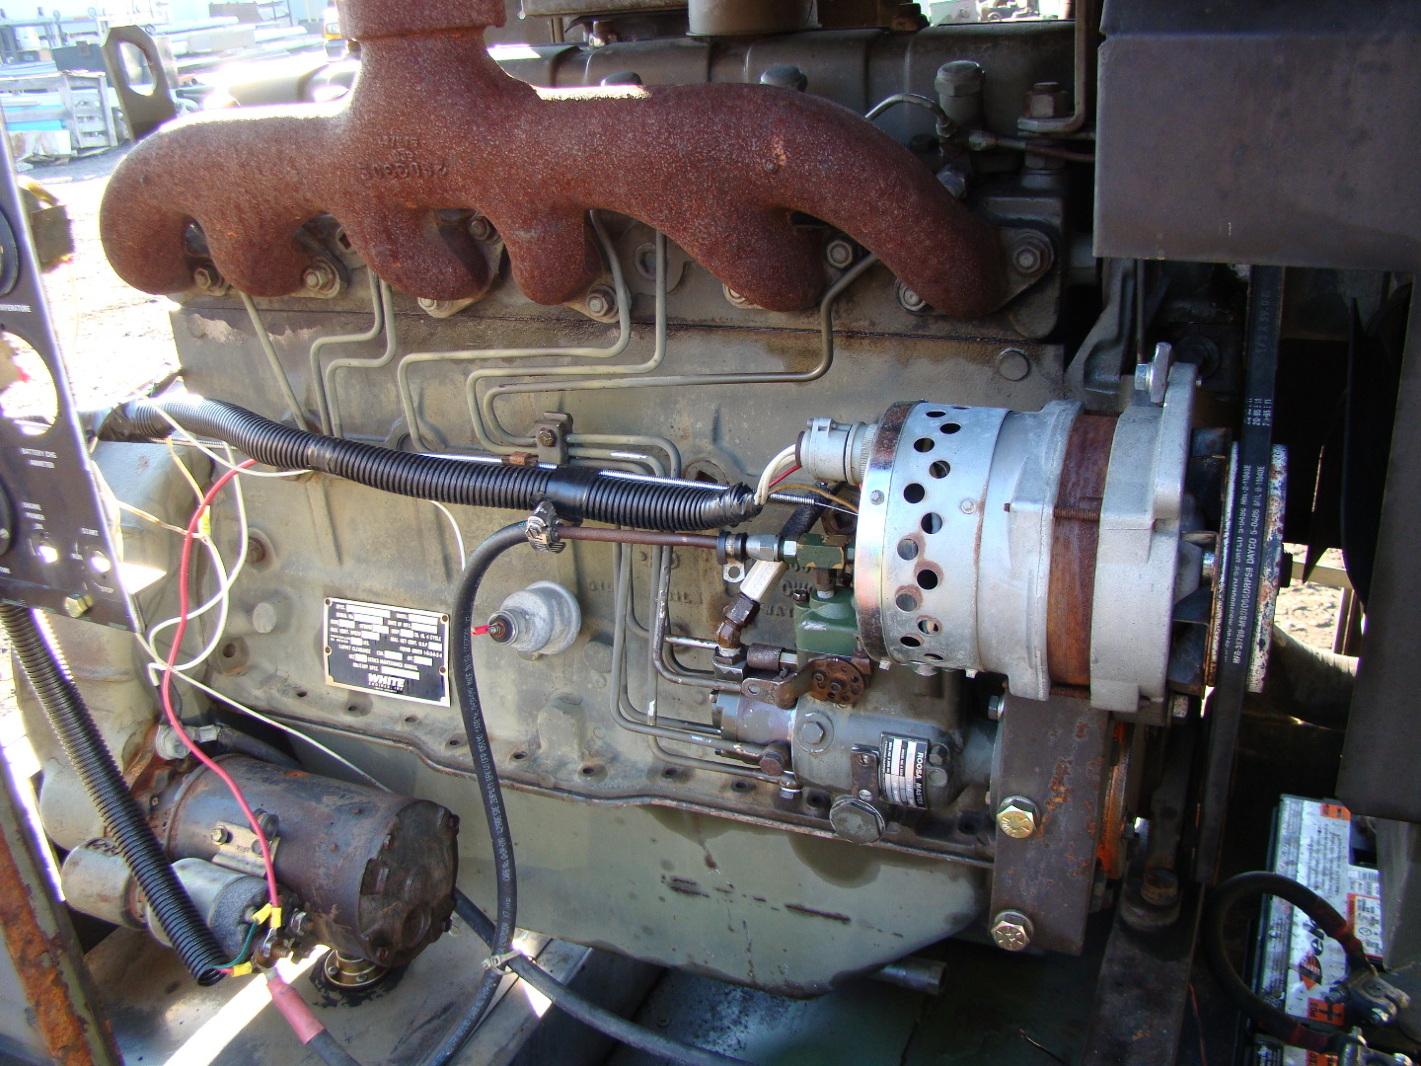 Hercules White Engines 63 Hp 6 Cyl Diesel Power Unit